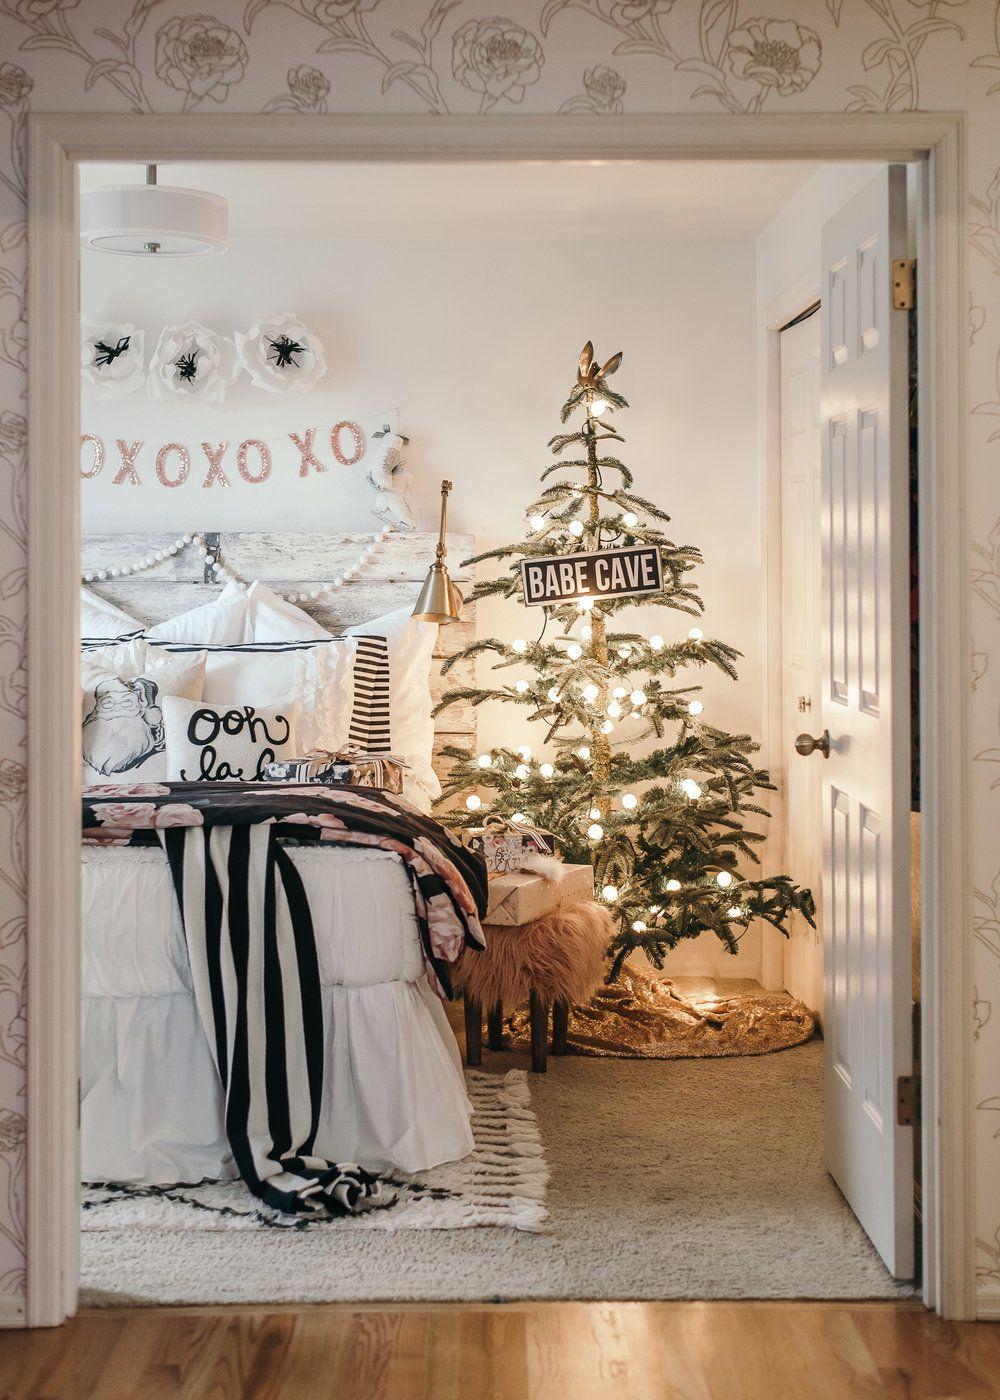 Coming Soon White Christmas Decor Fun Christmas Decorations Girl Bedroom Decor The girls christmas bedroom